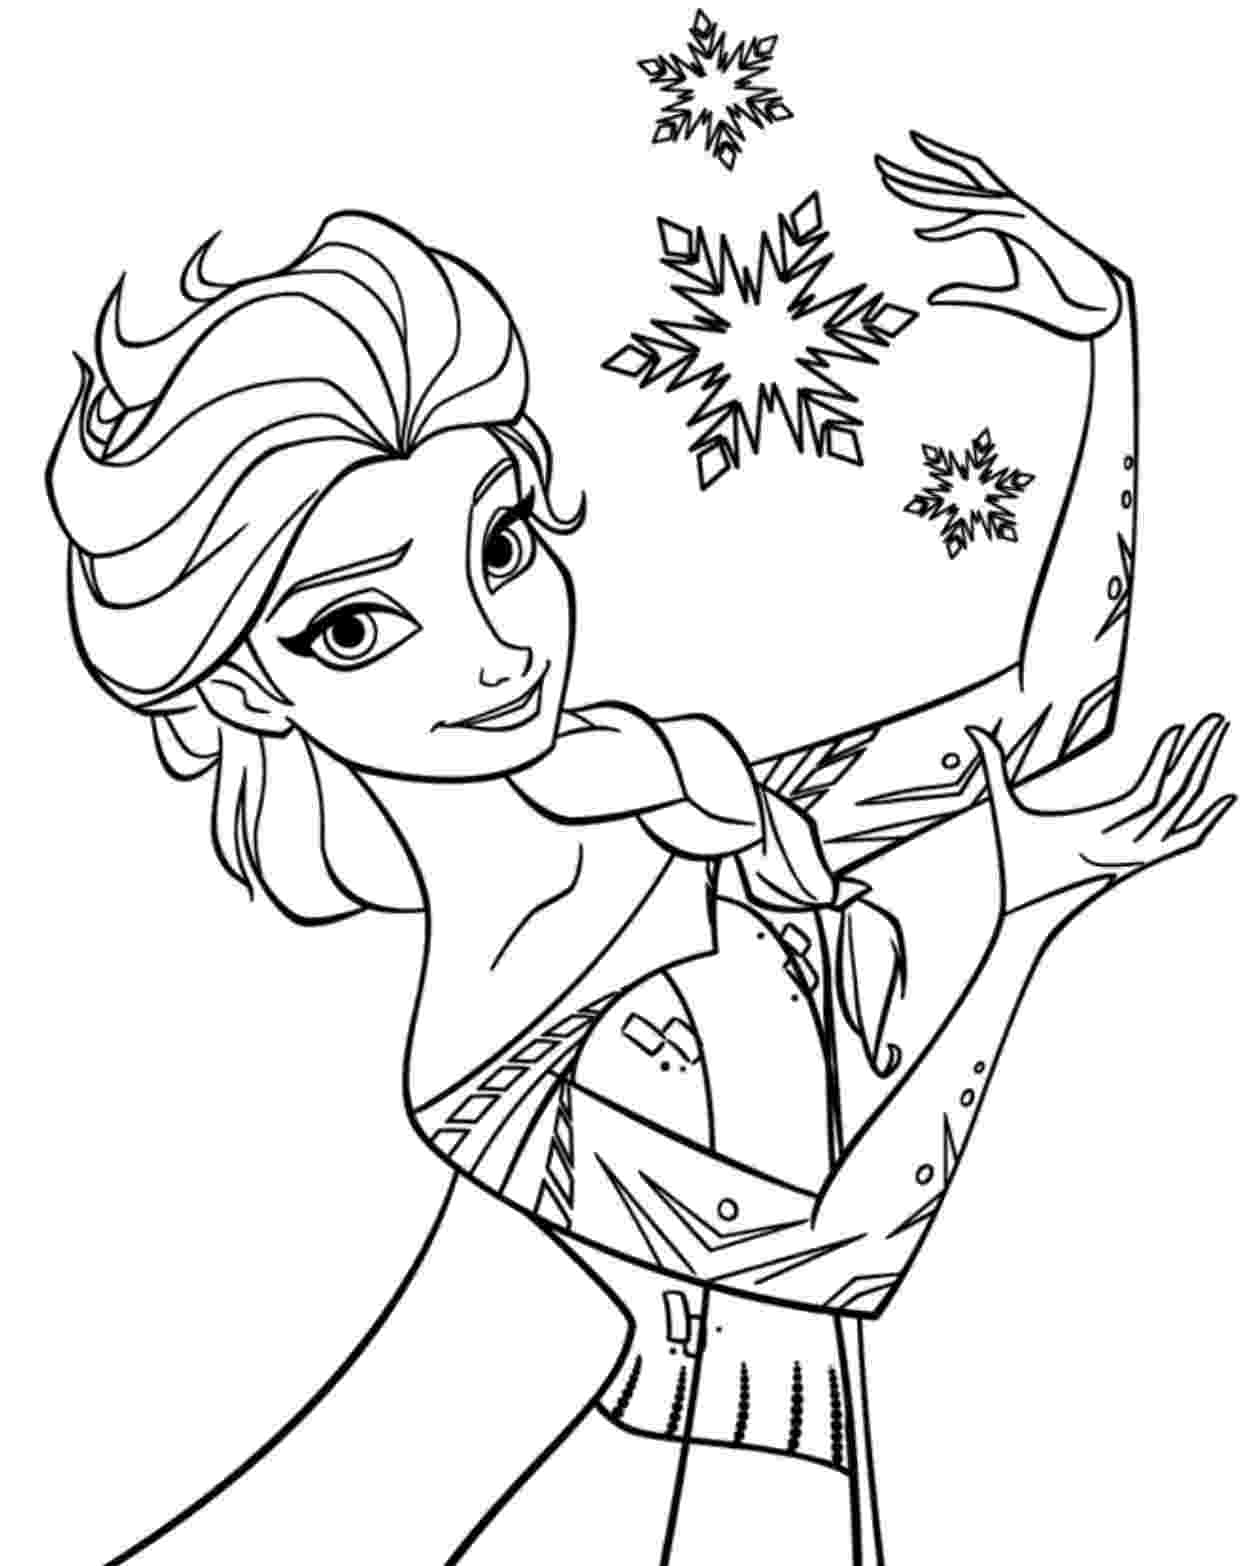 elsa coloring pages free printable elsa coloring pages for kids best pages coloring elsa